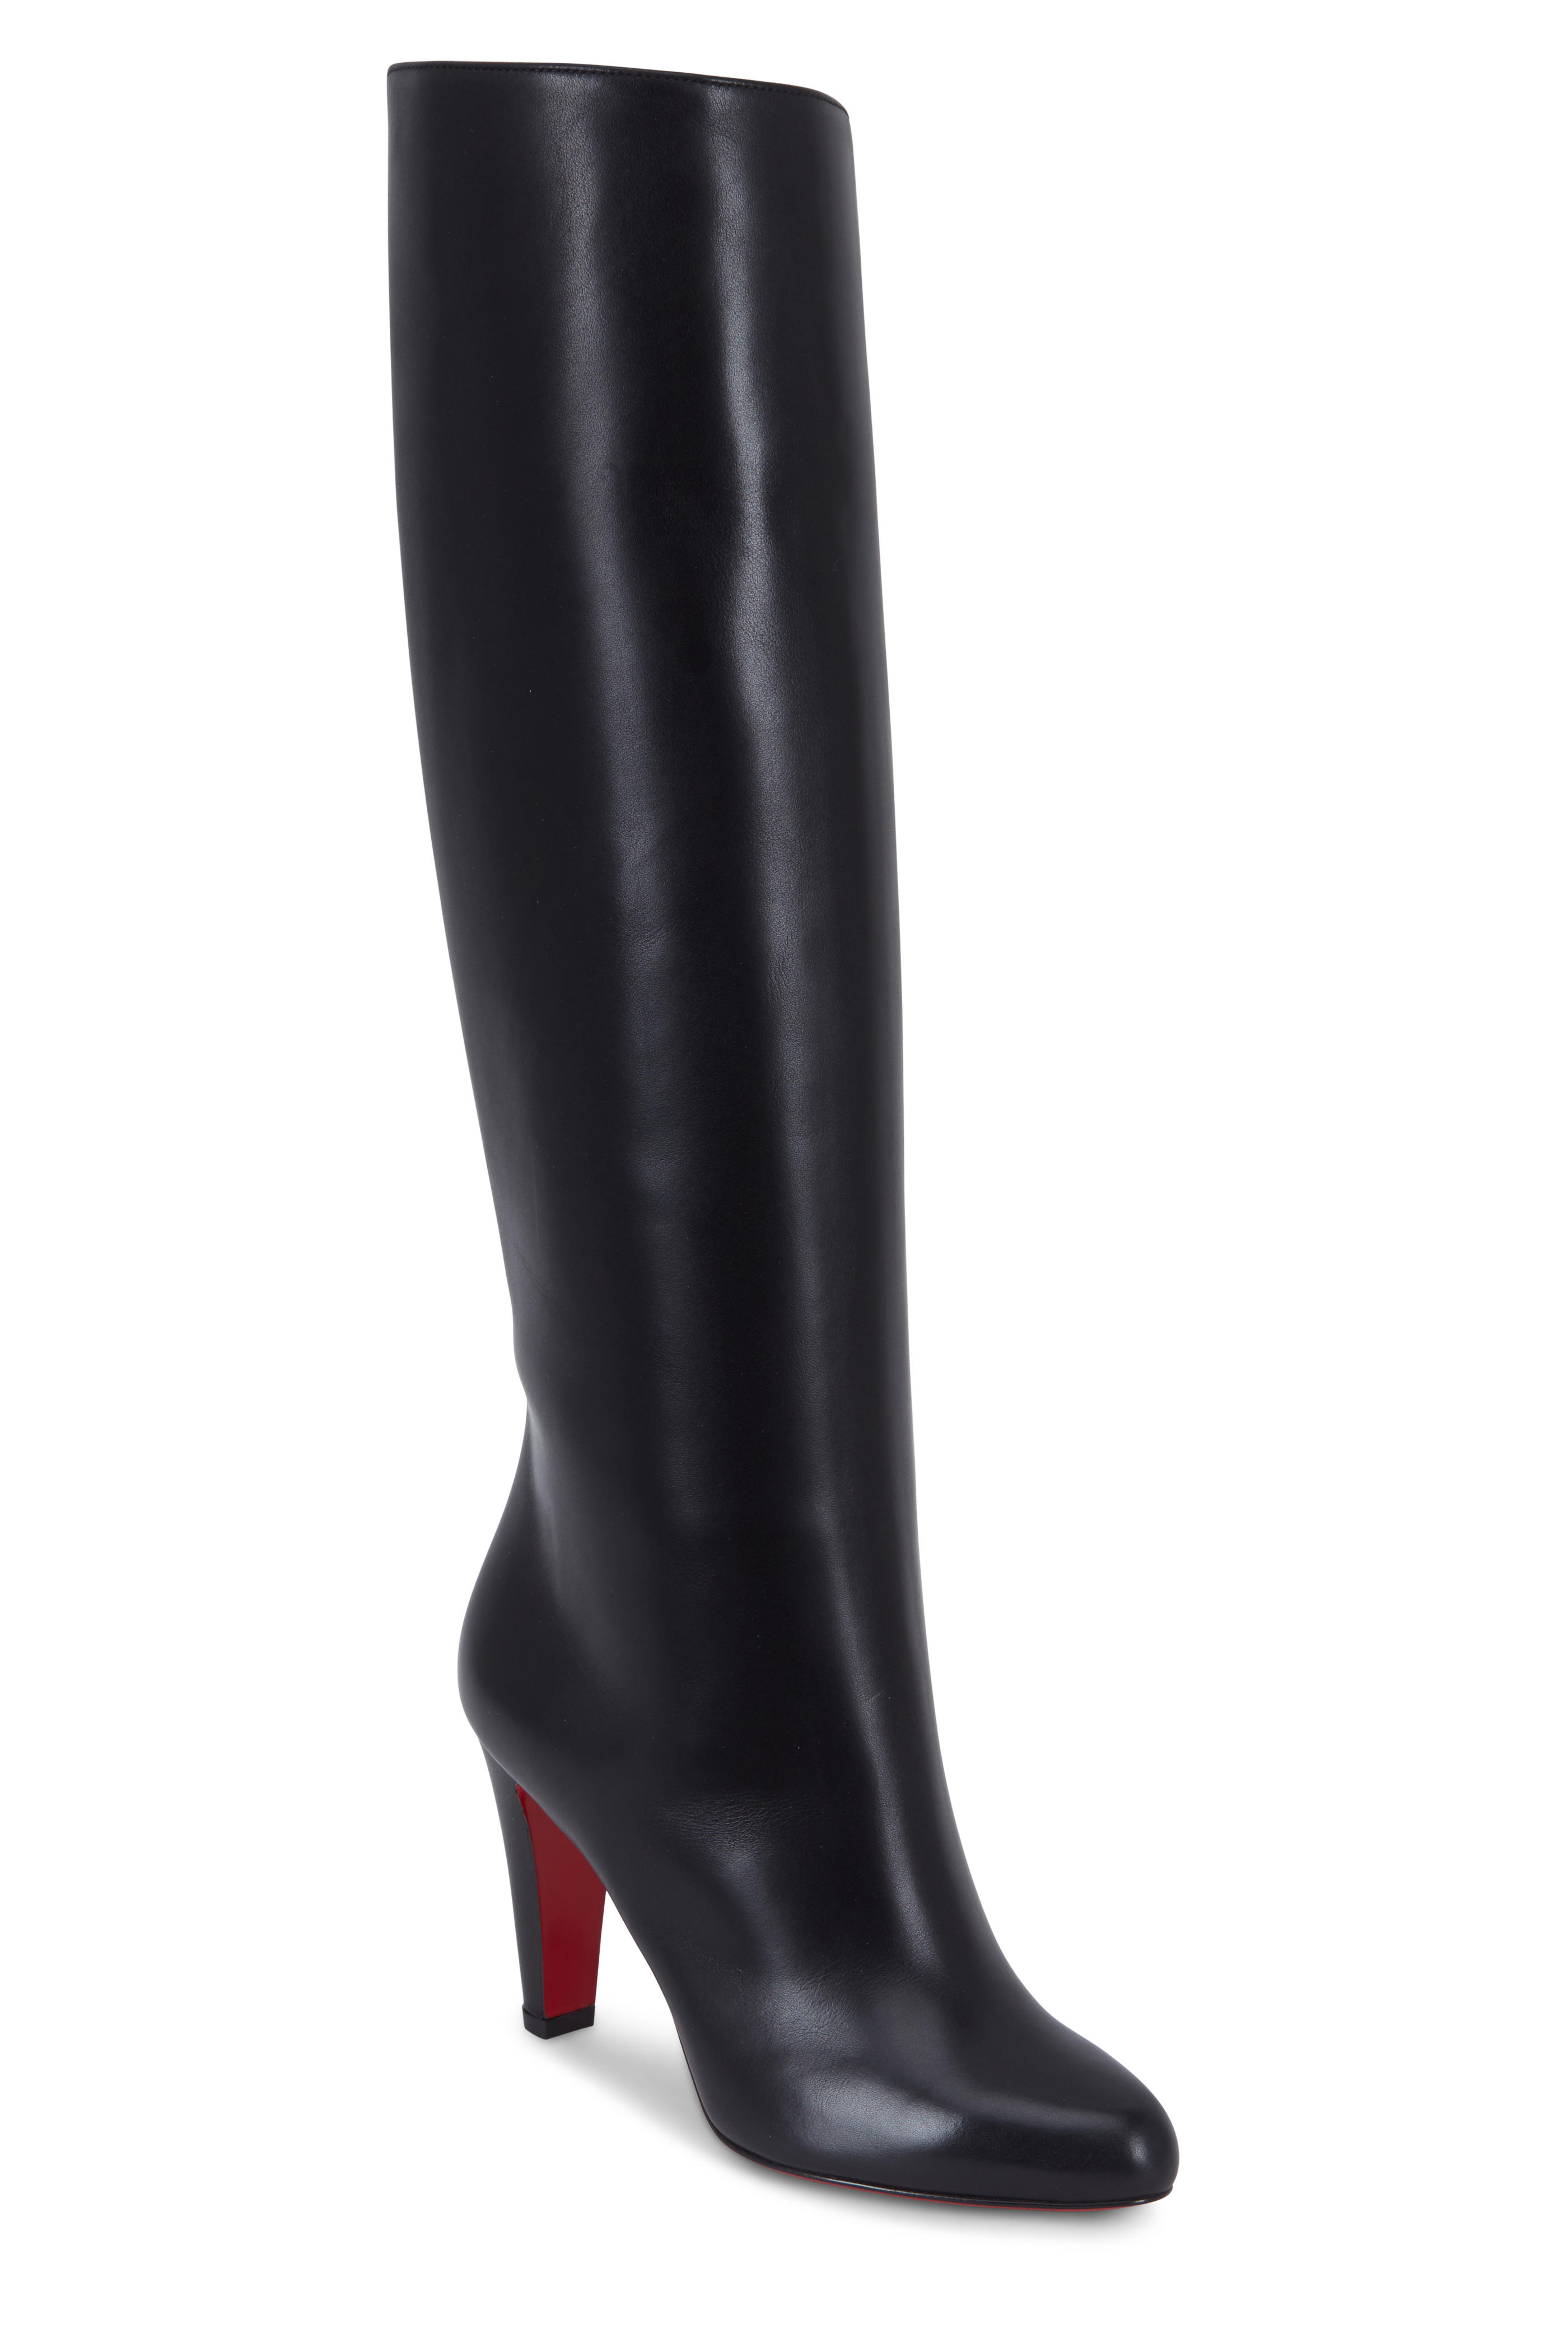 huge selection of aa601 958b5 Christian Louboutin - Marmara Black Leather Tall Opera Boot ...